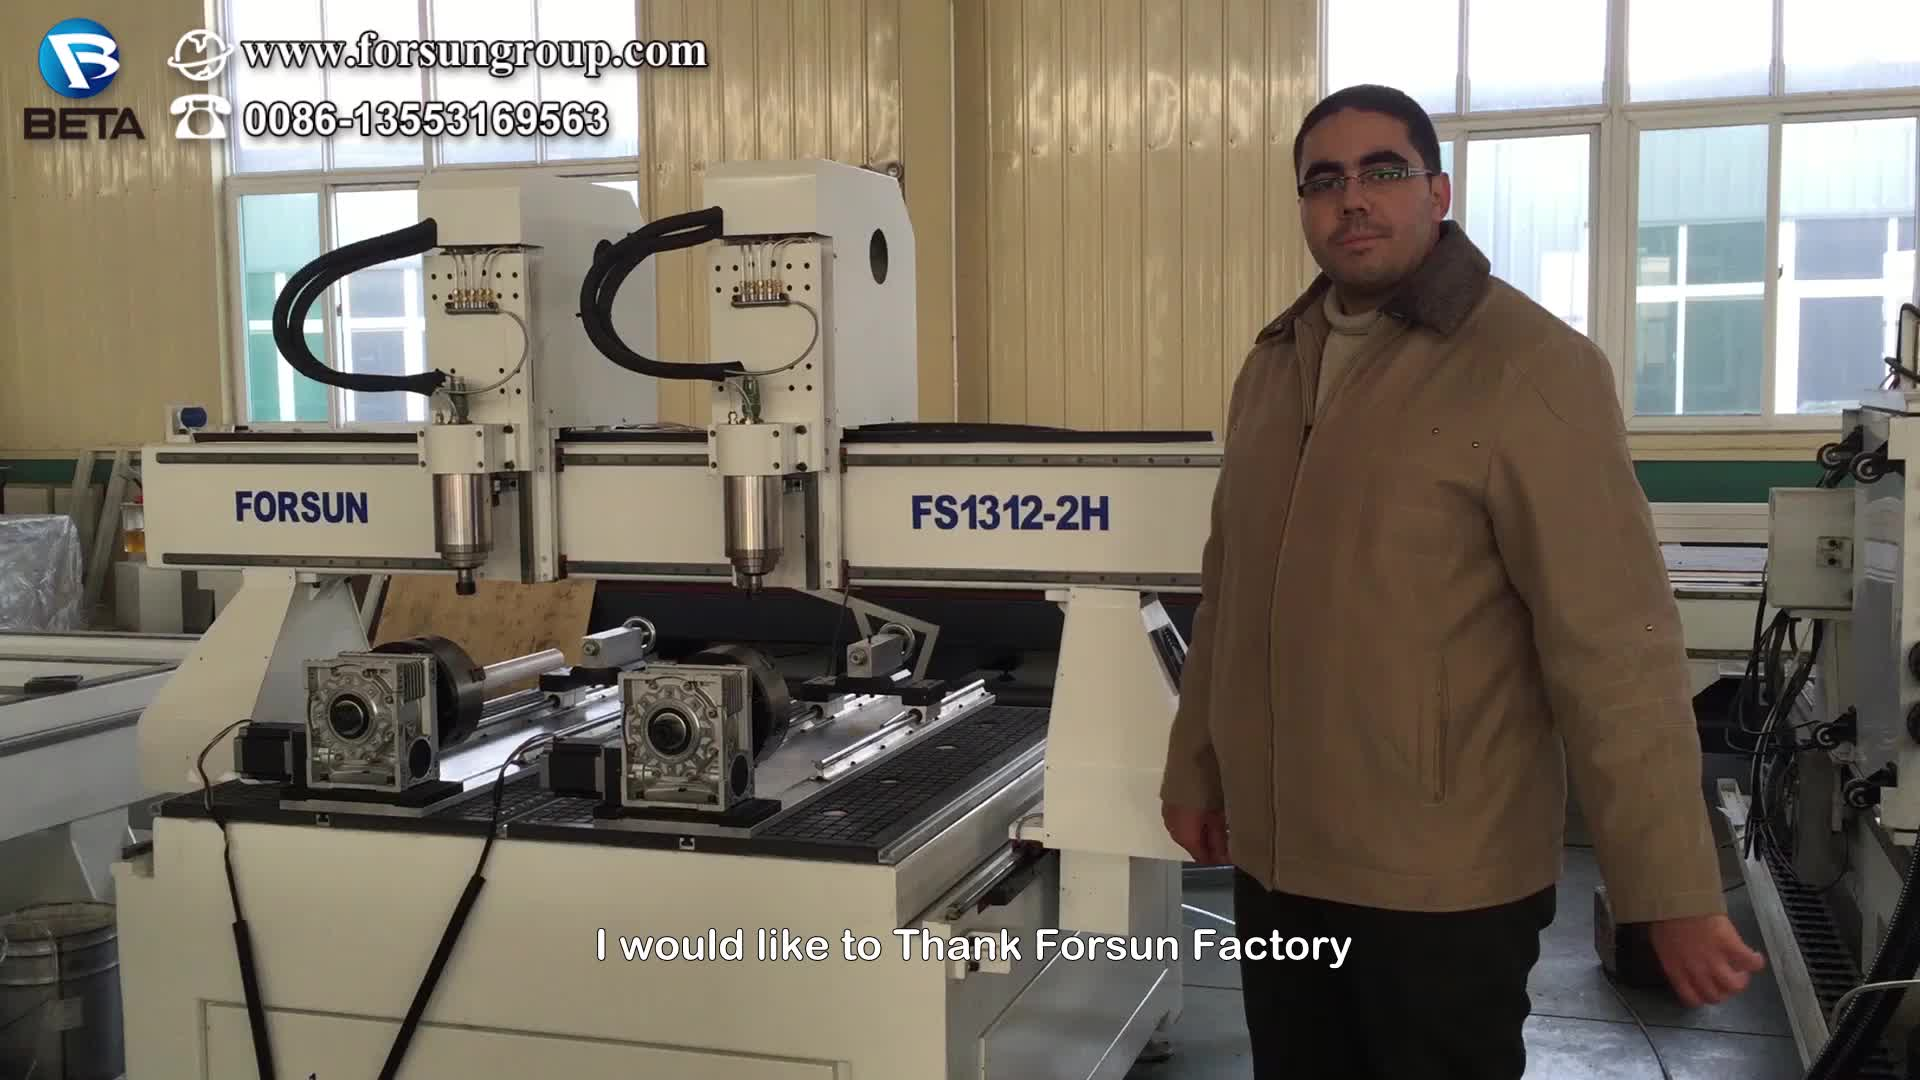 Hot koop cnc router sd-1325 servo motor rotary aman machines verkoop in bangladesh